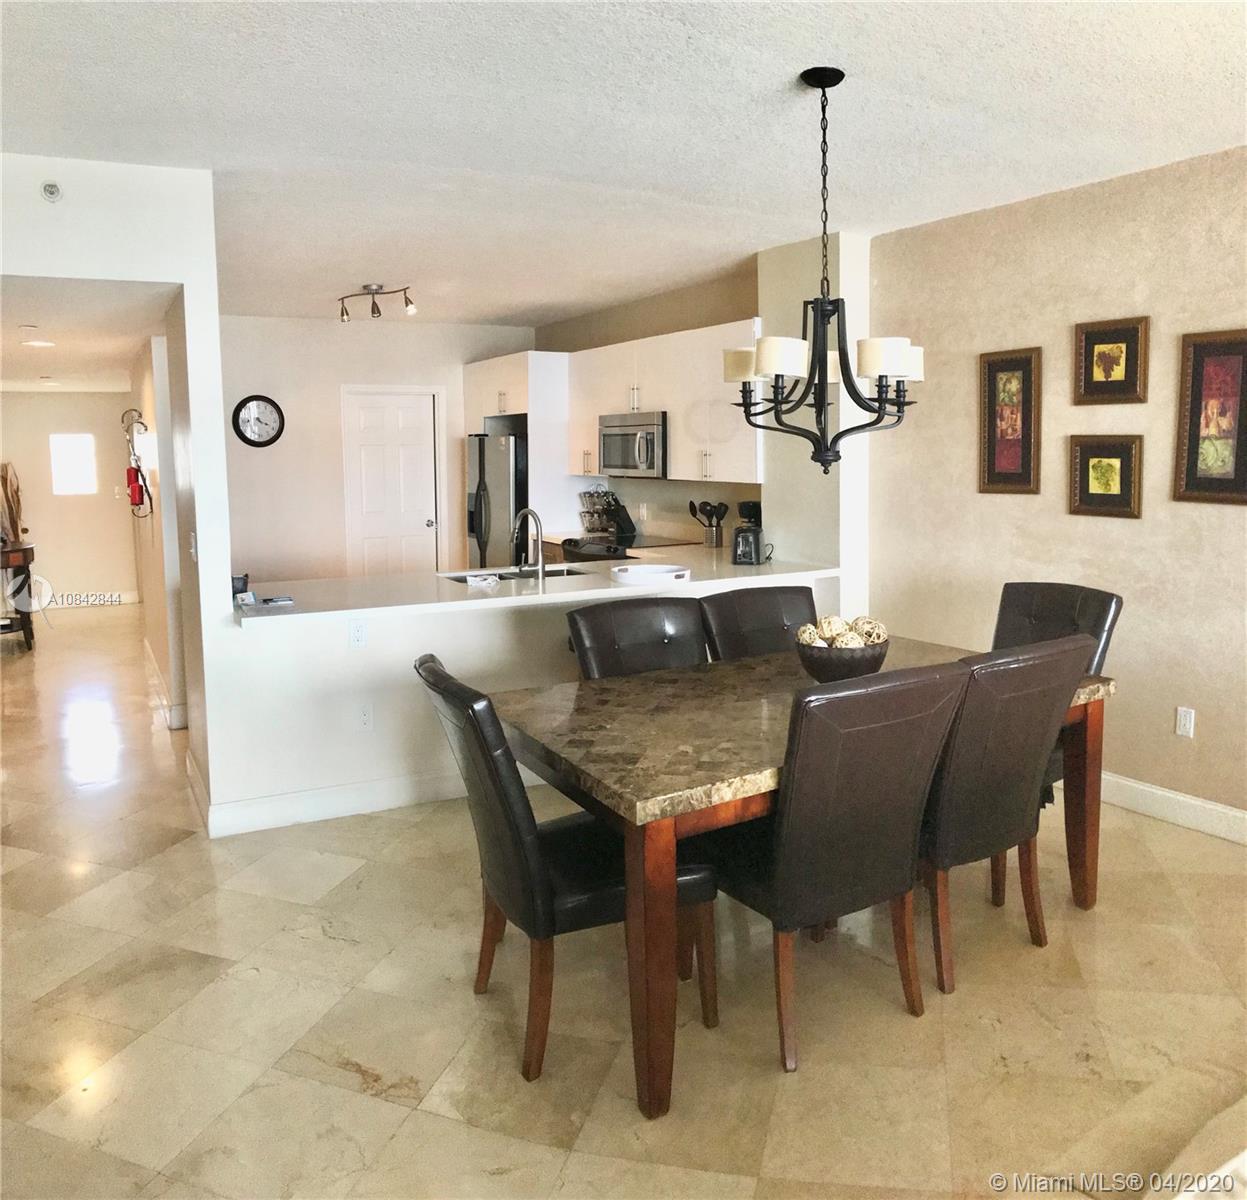 17050 N Bay Rd # 1004, Sunny Isles Beach, Florida 33160, 2 Bedrooms Bedrooms, ,2 BathroomsBathrooms,Residential,For Sale,17050 N Bay Rd # 1004,A10842844